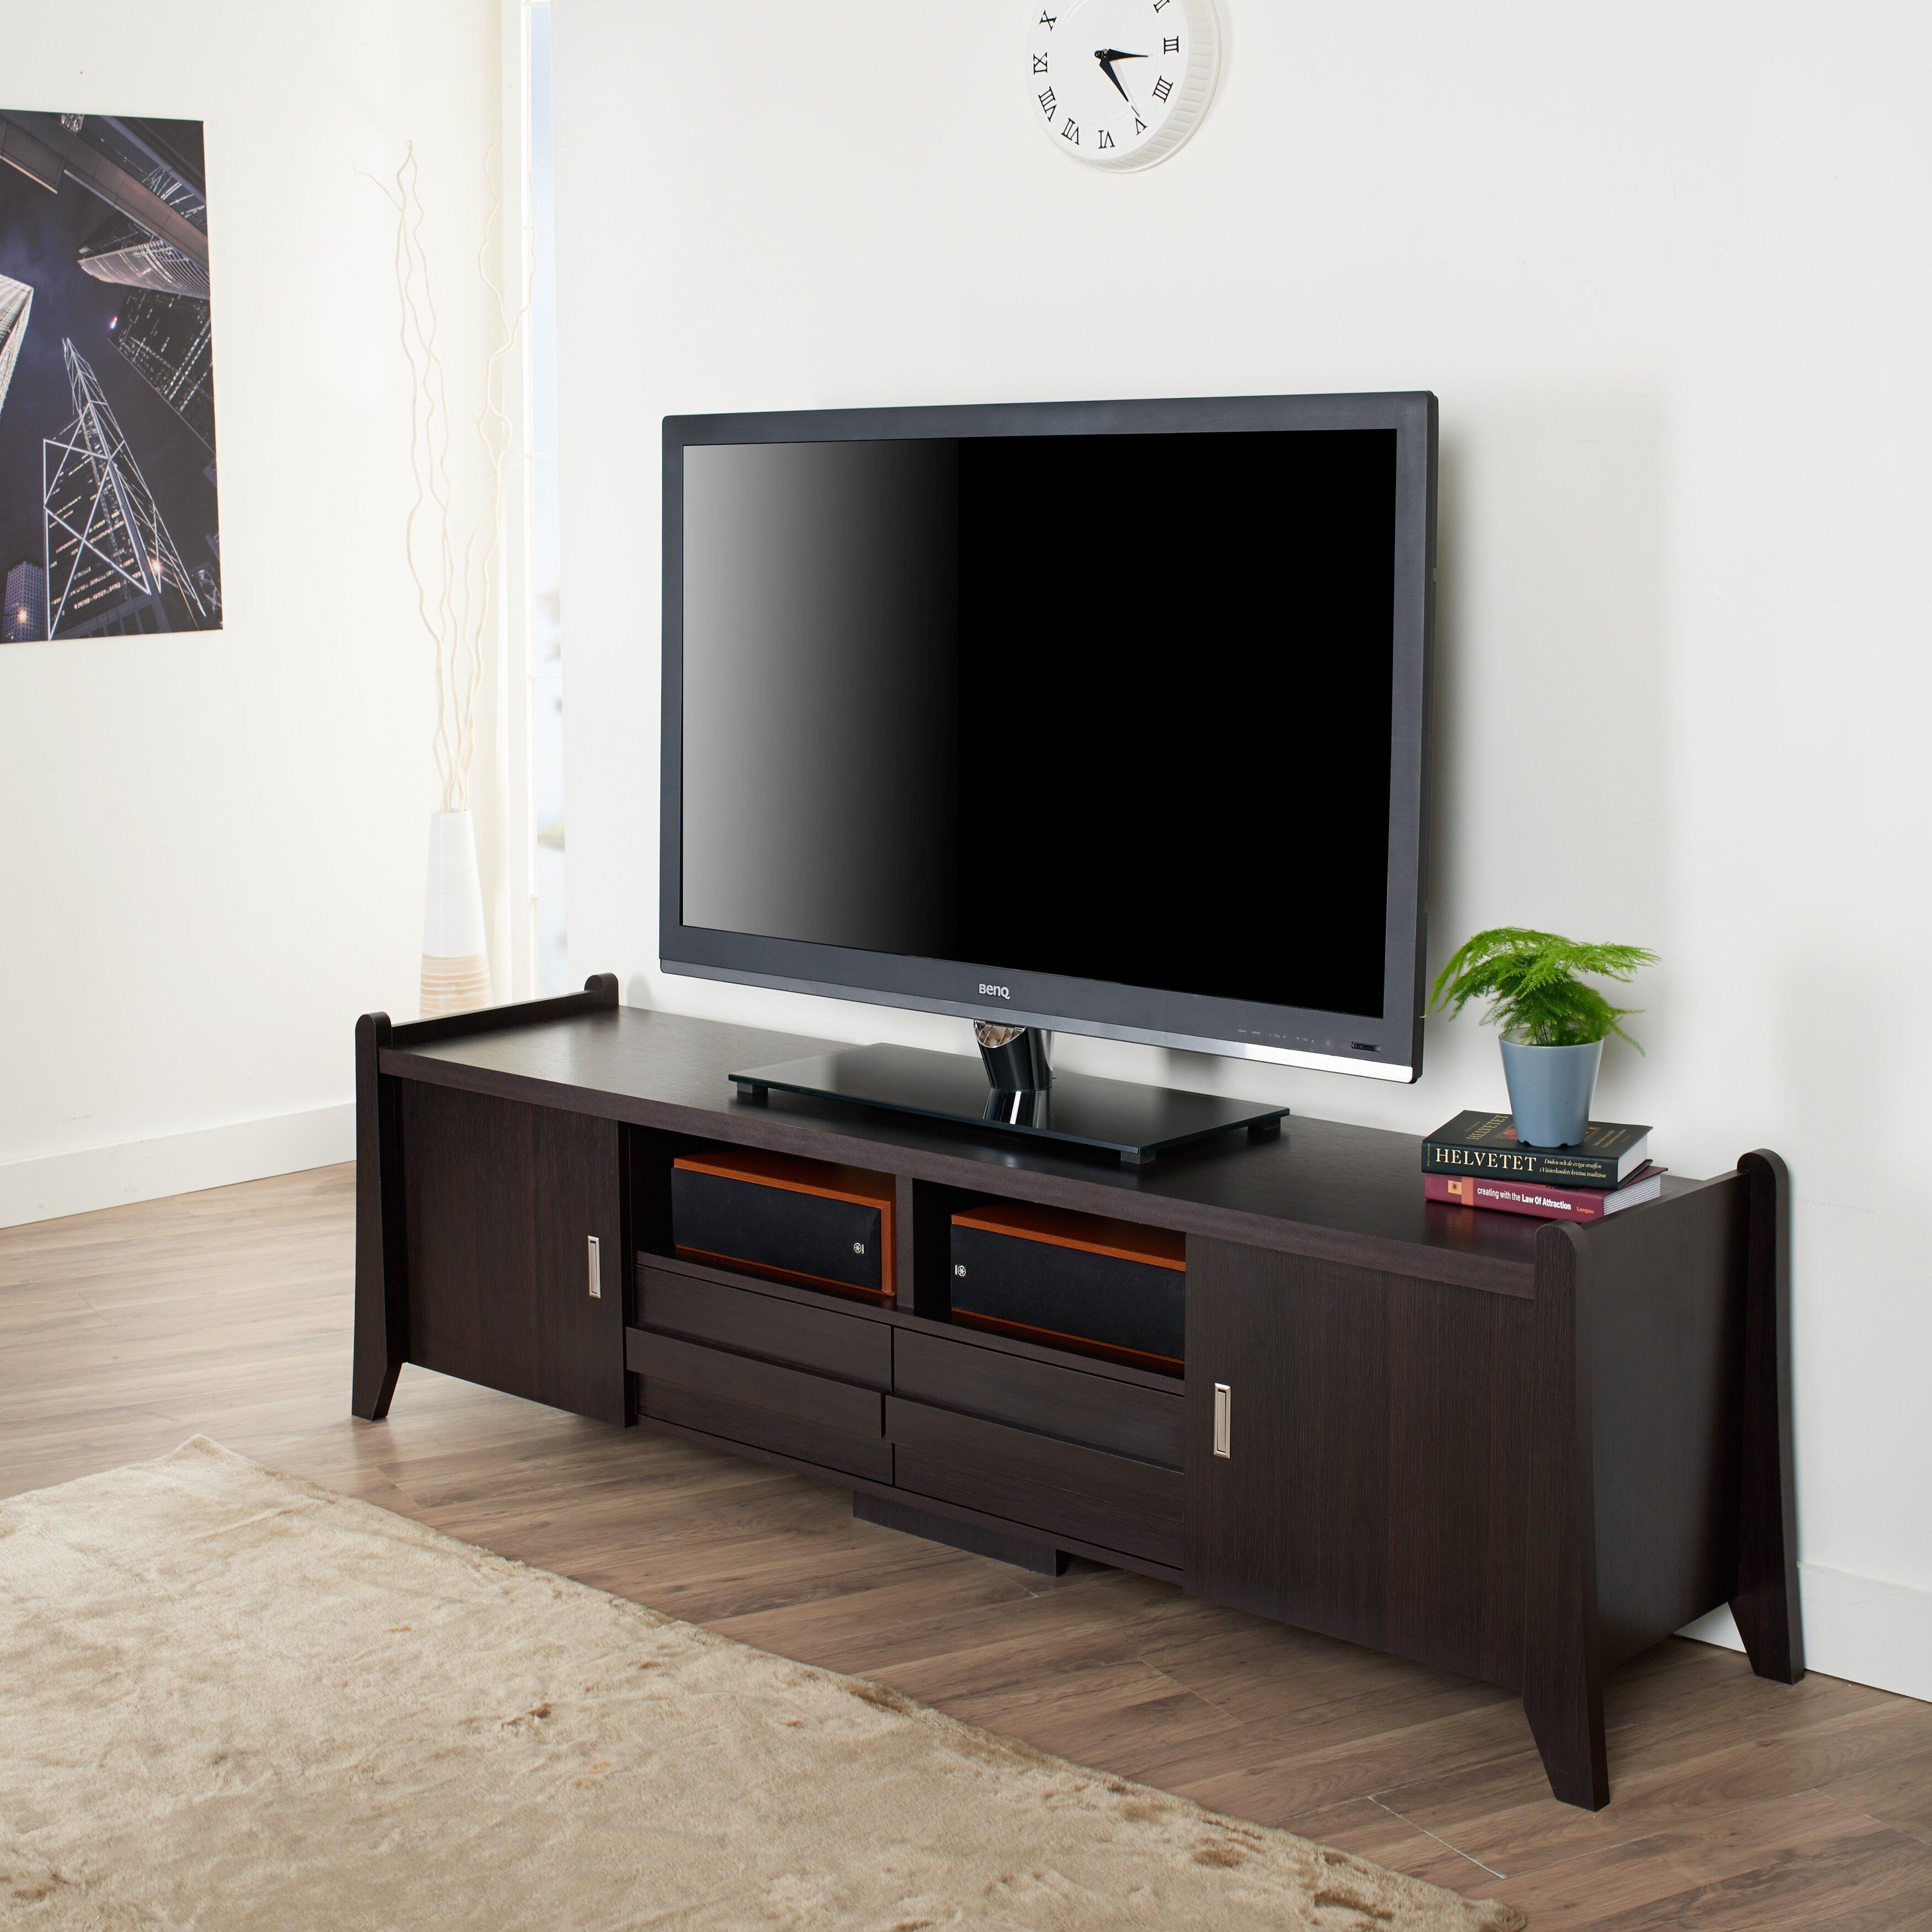 Hokku Designs Hanson Tv Stand Reviews